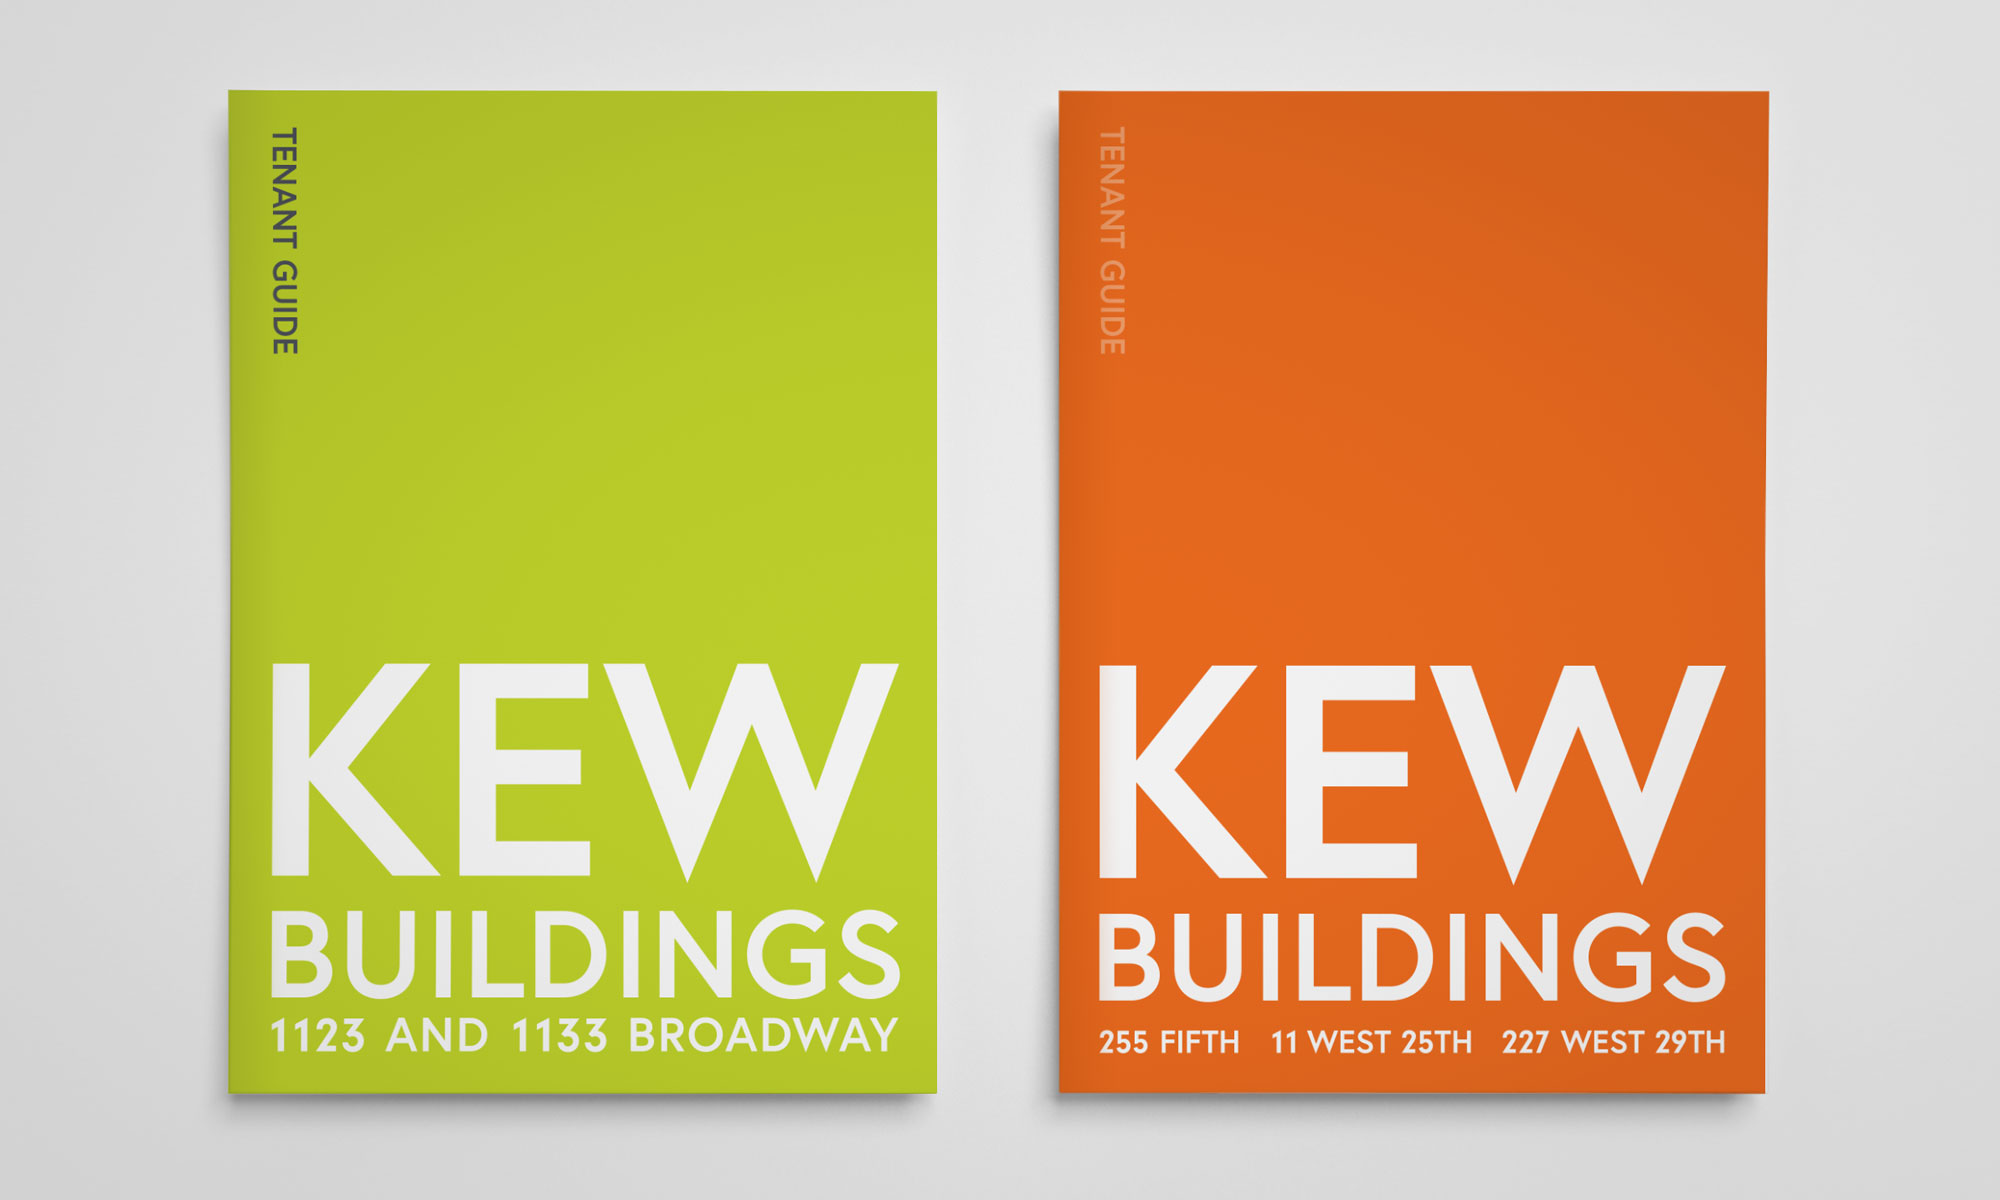 Kew Management Tenant Guide Covers